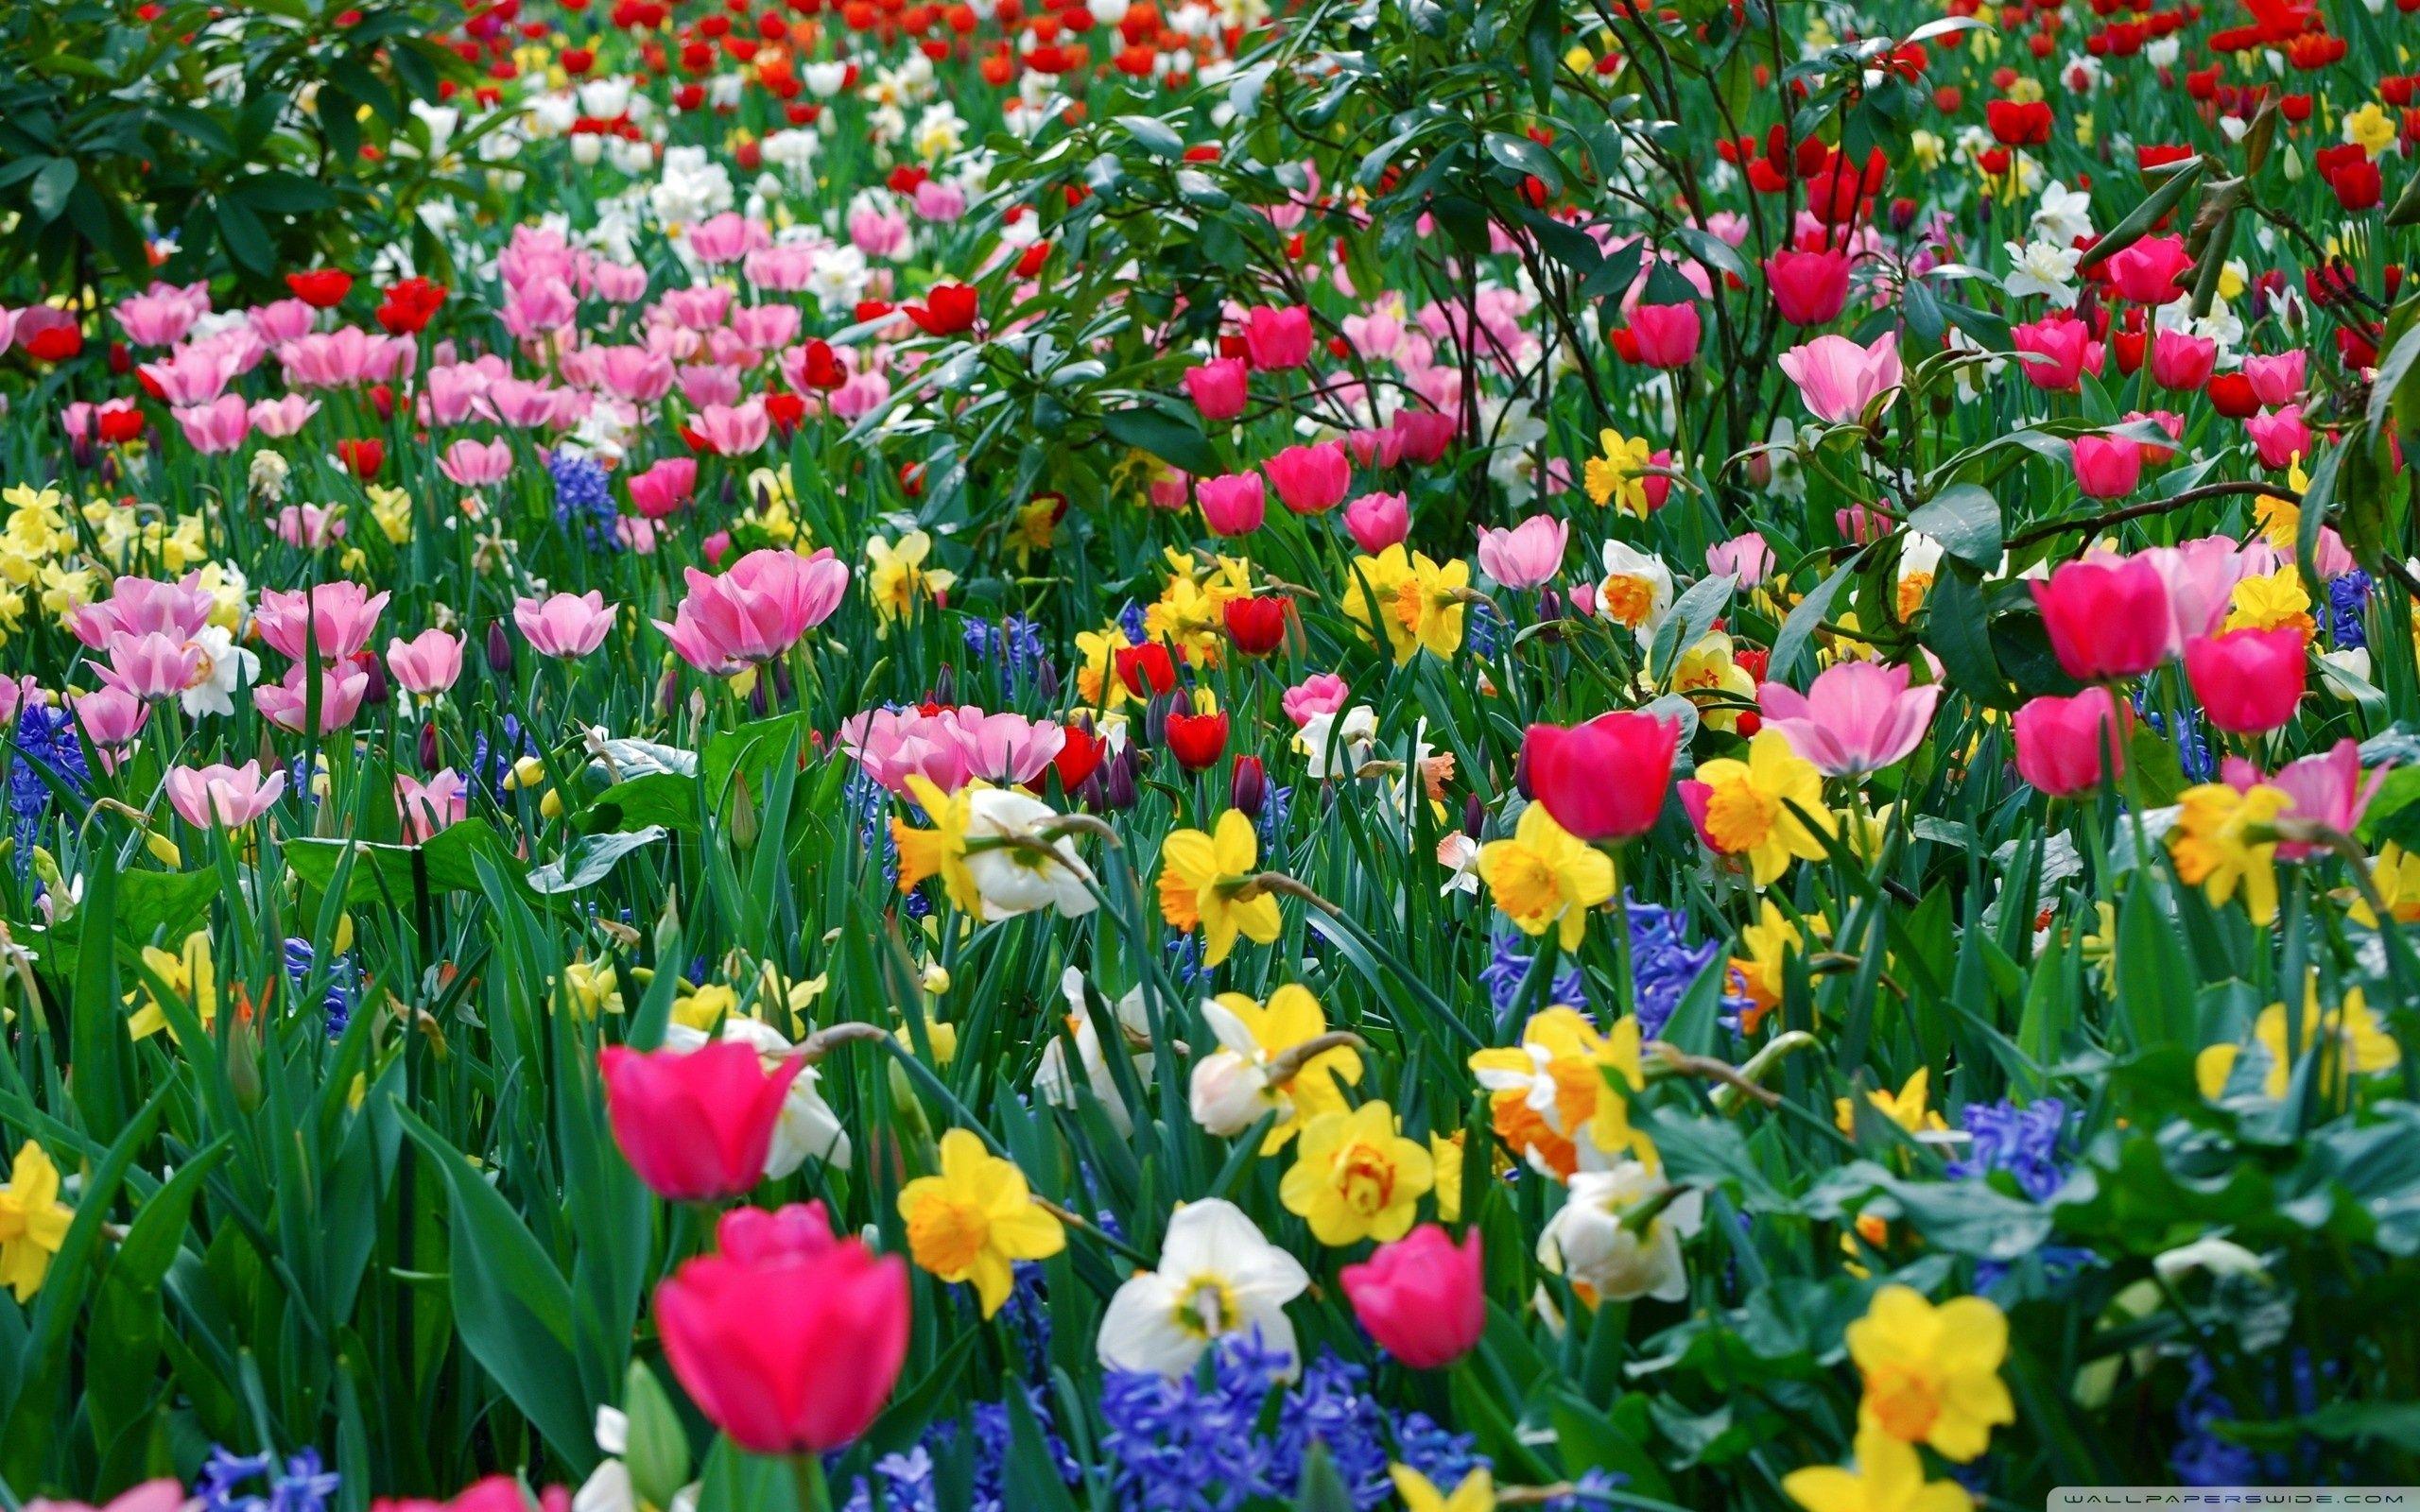 spring flowers background | spring flowers wallpaper hd desktop